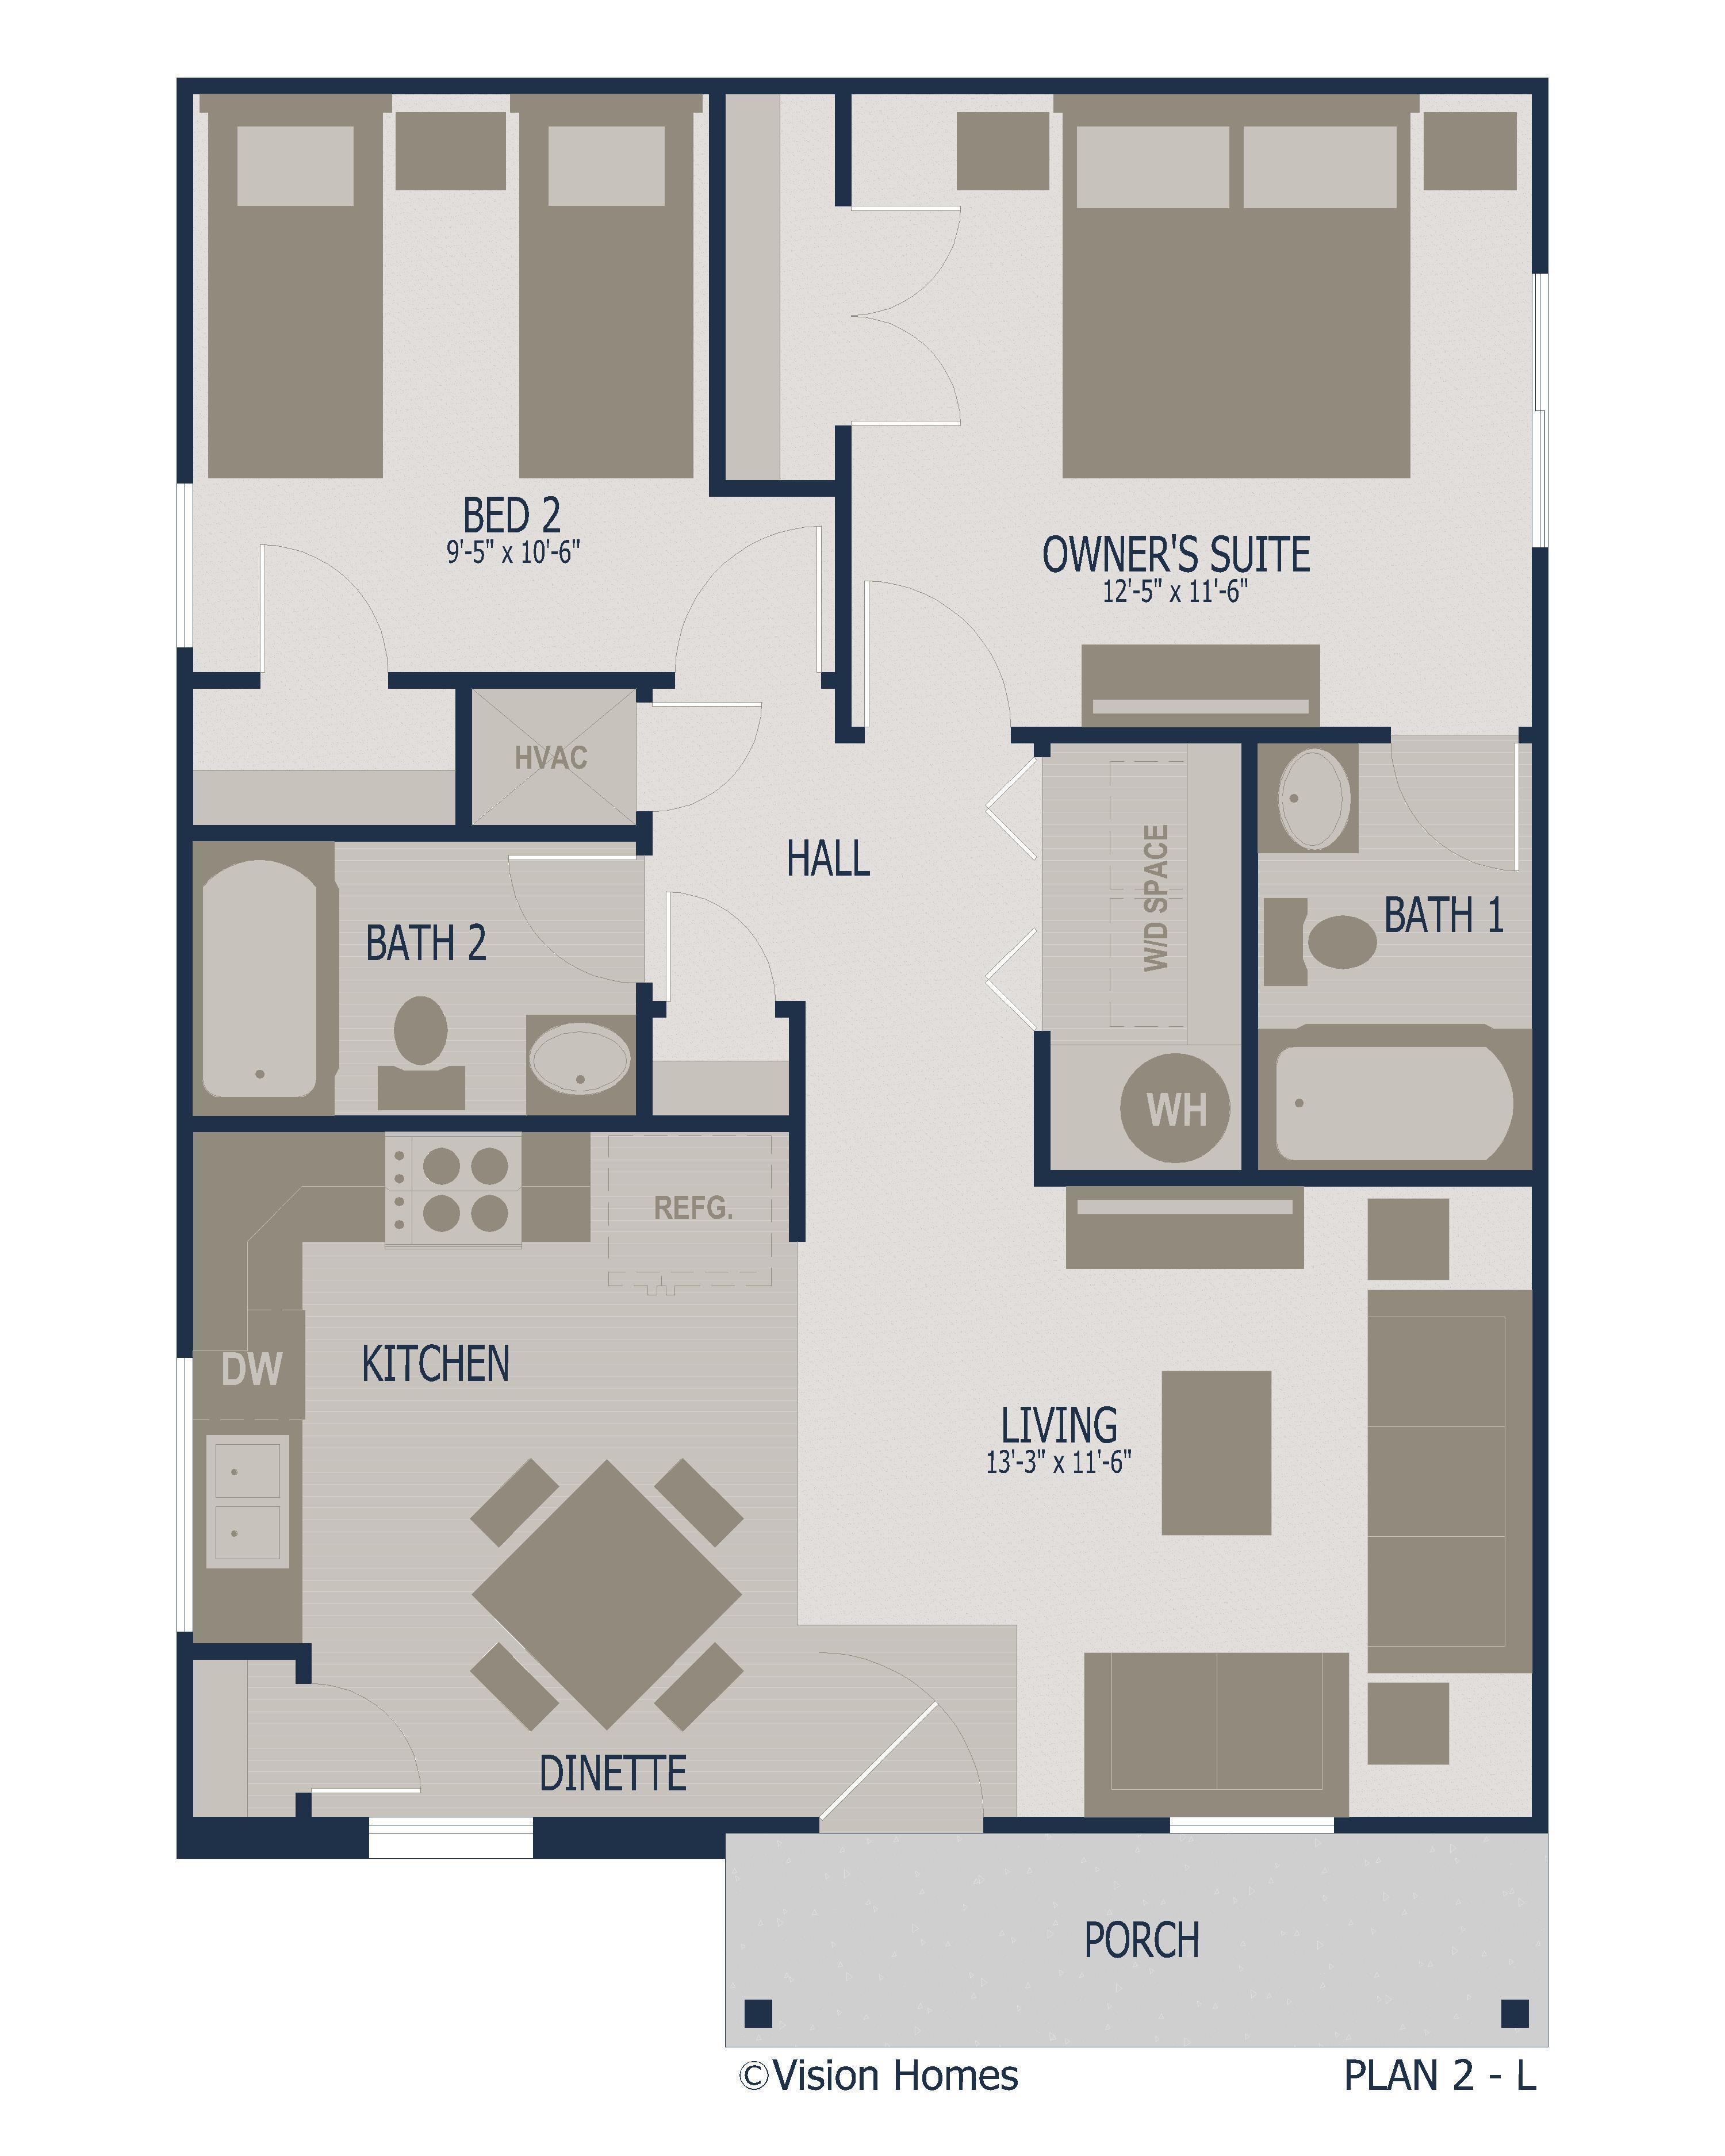 PLAN 2 Floorplan